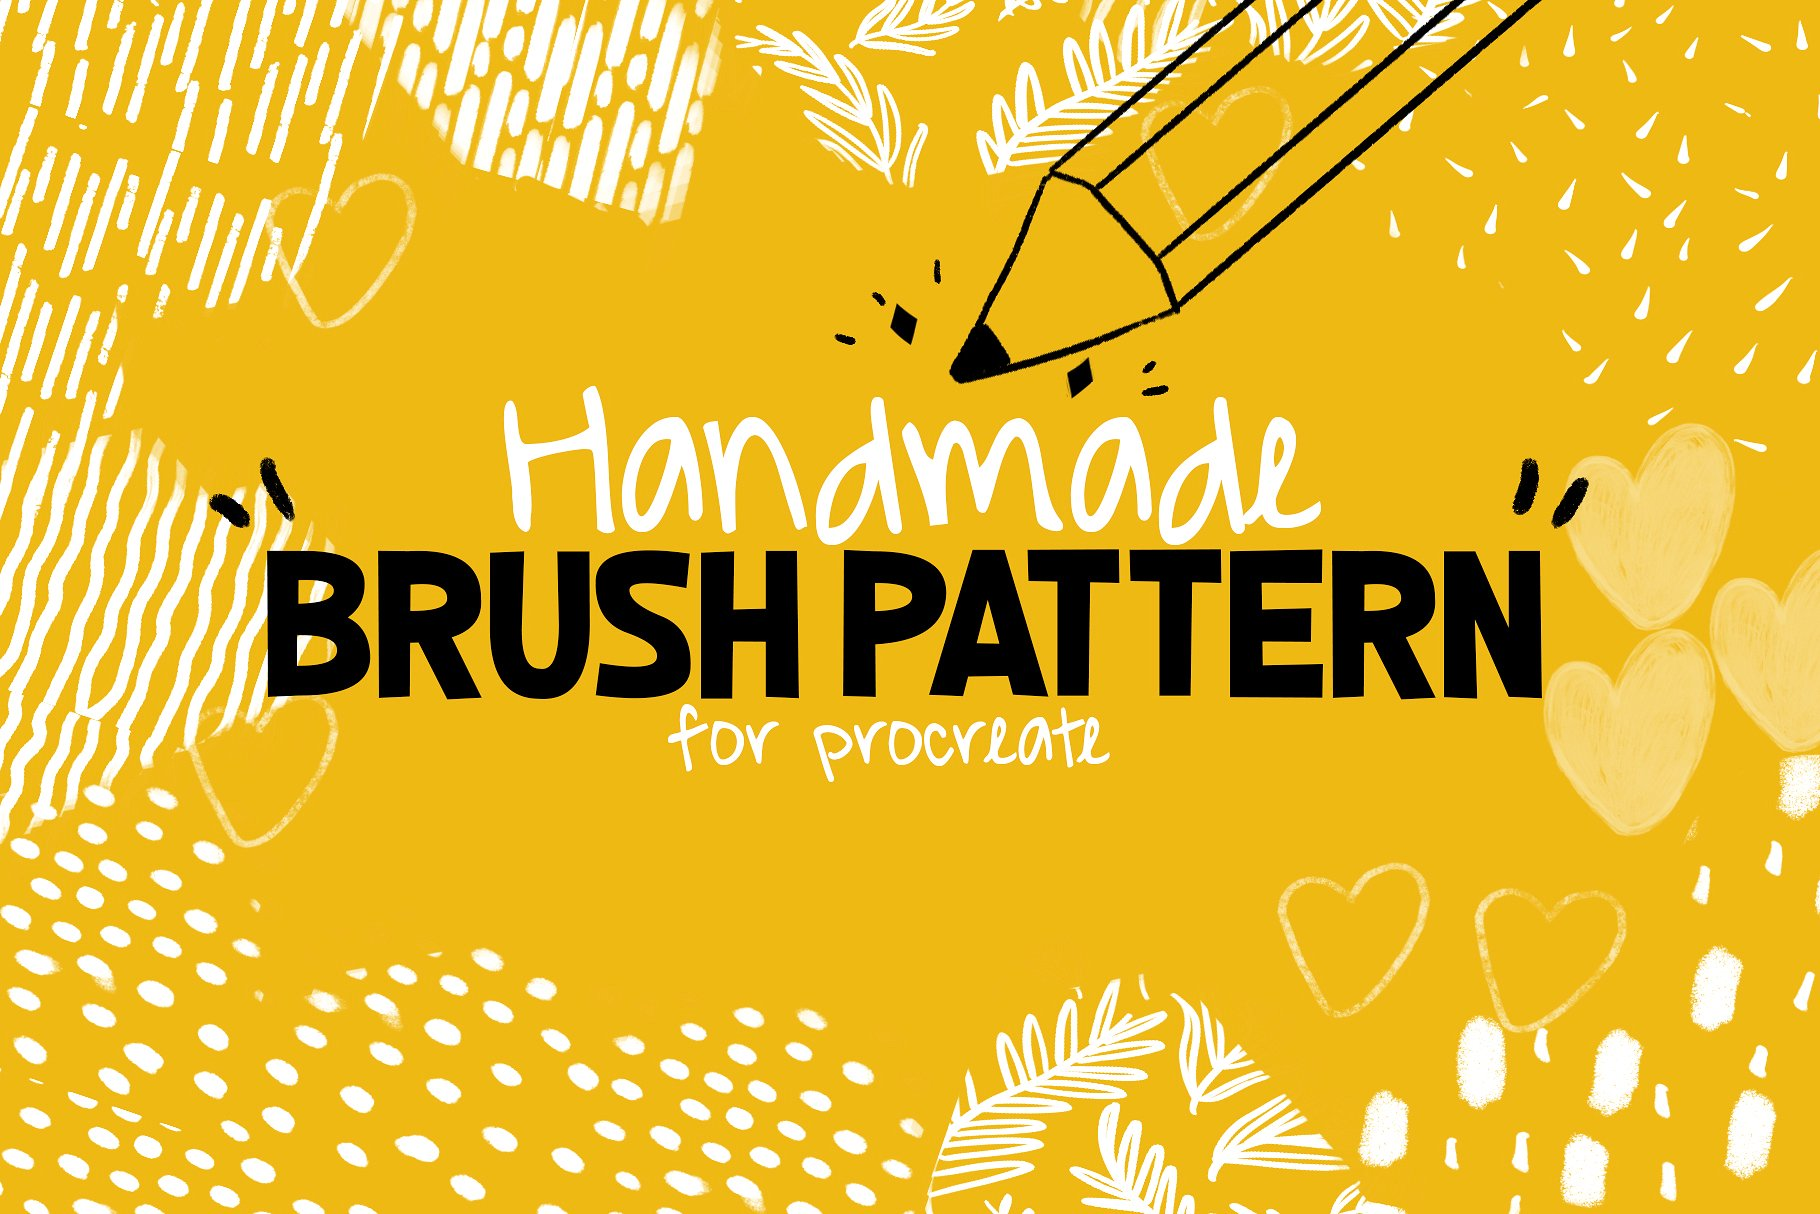 Handmade Brush Pattern - Procreate example image 1